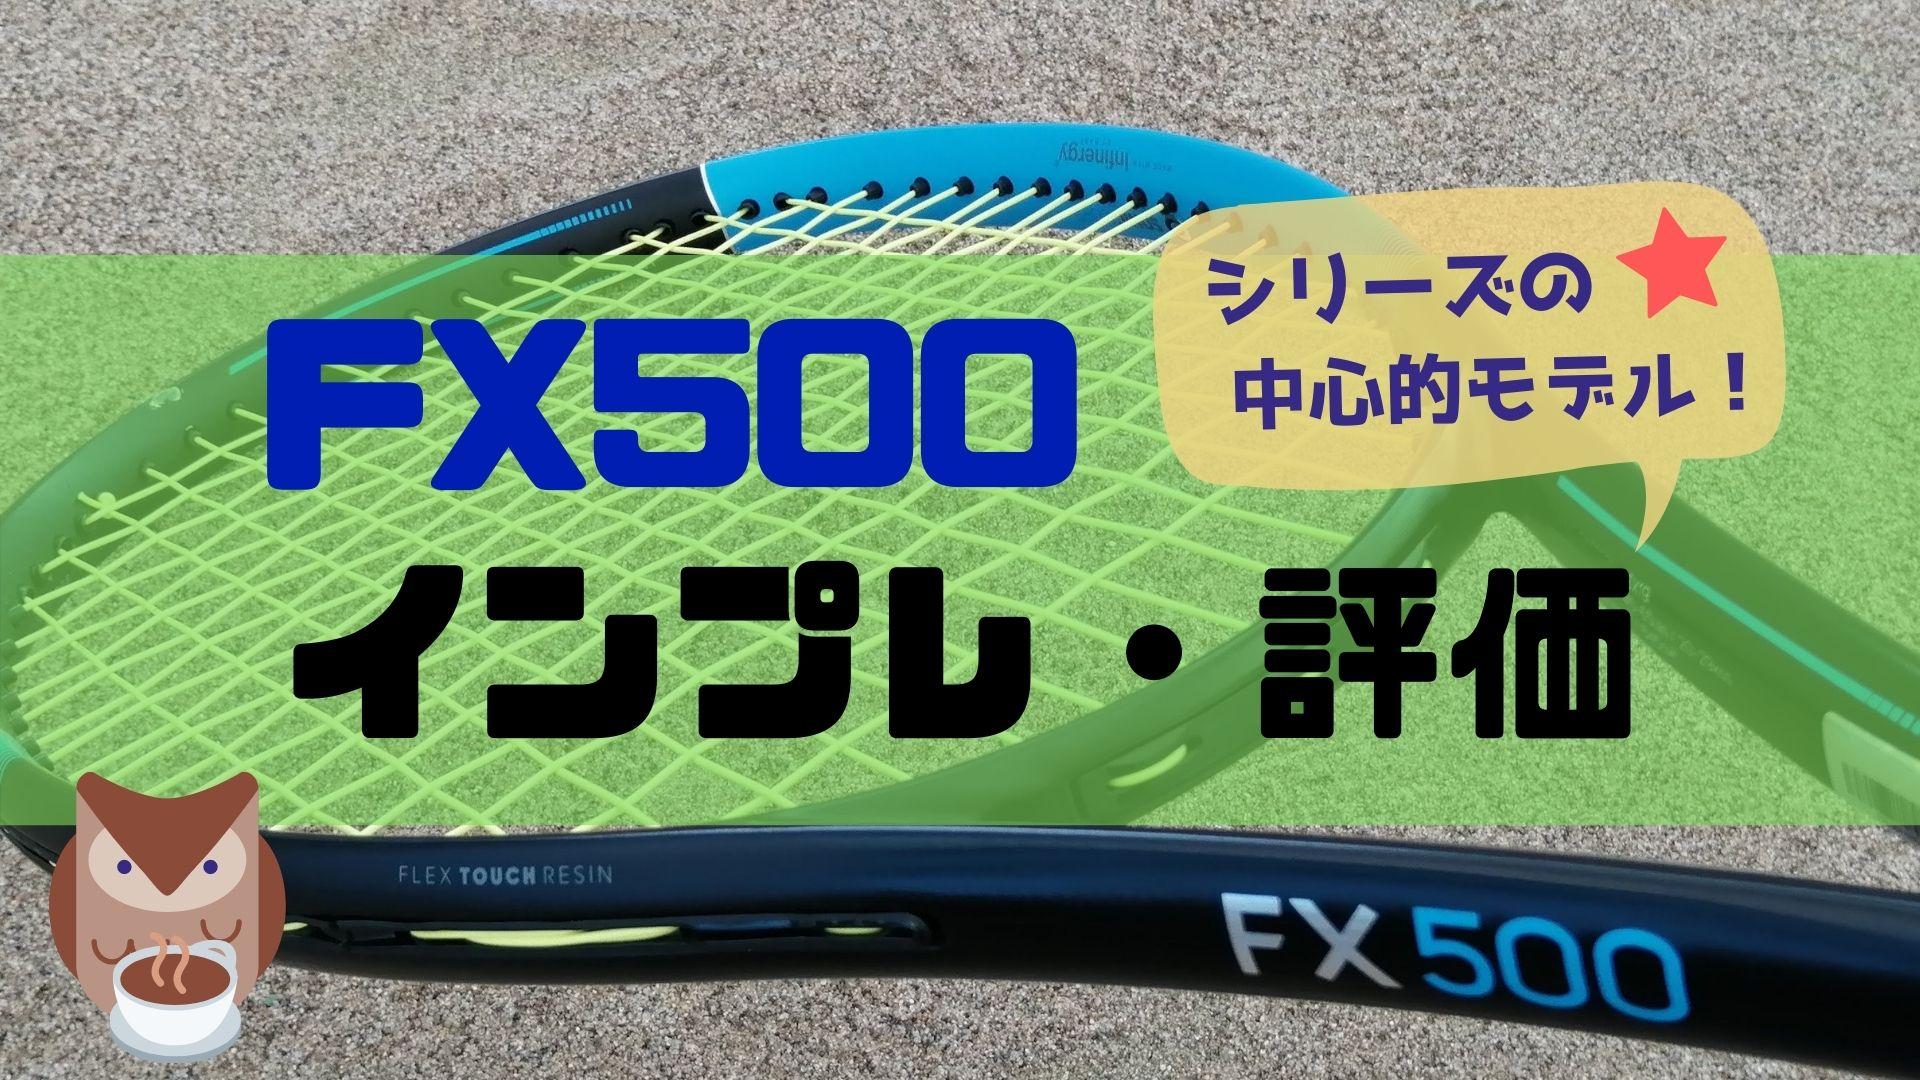 FX500 ダンロップ【インプレ評価】DUNLOP 新FXシリーズ